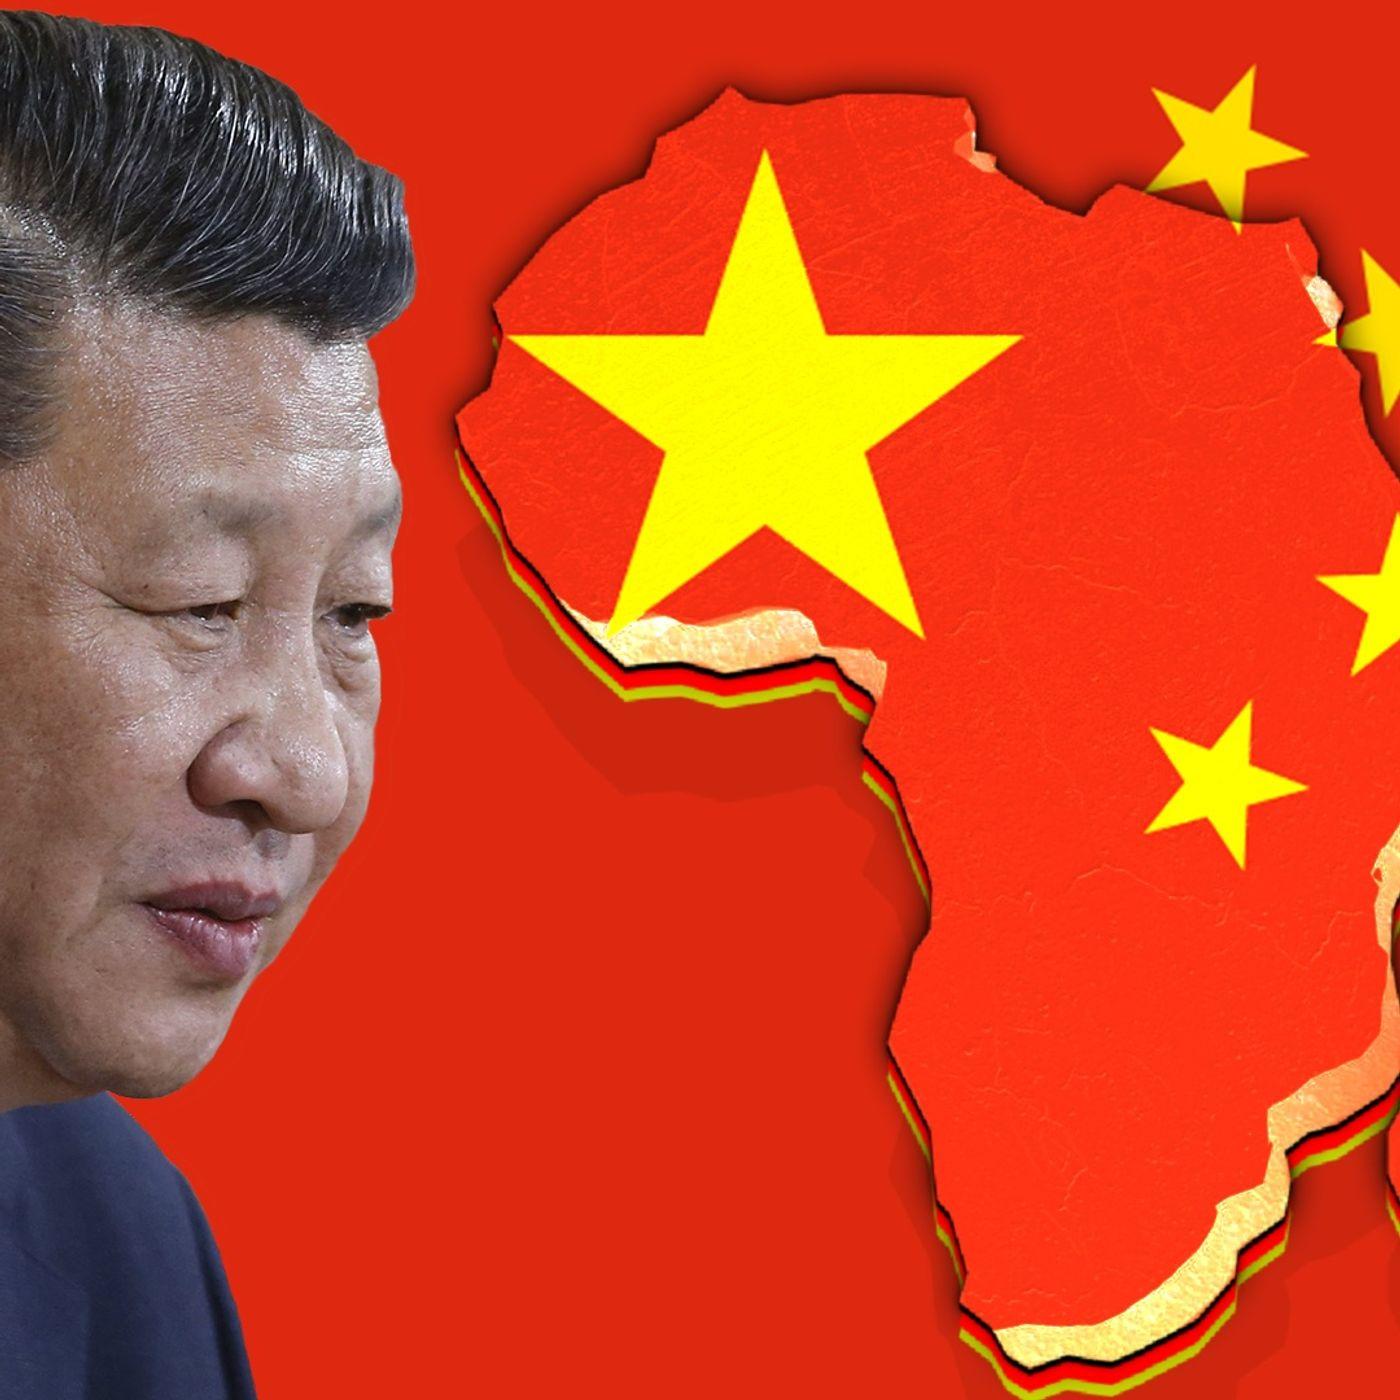 Perché la Cina investe in Africa? (Parte 1)